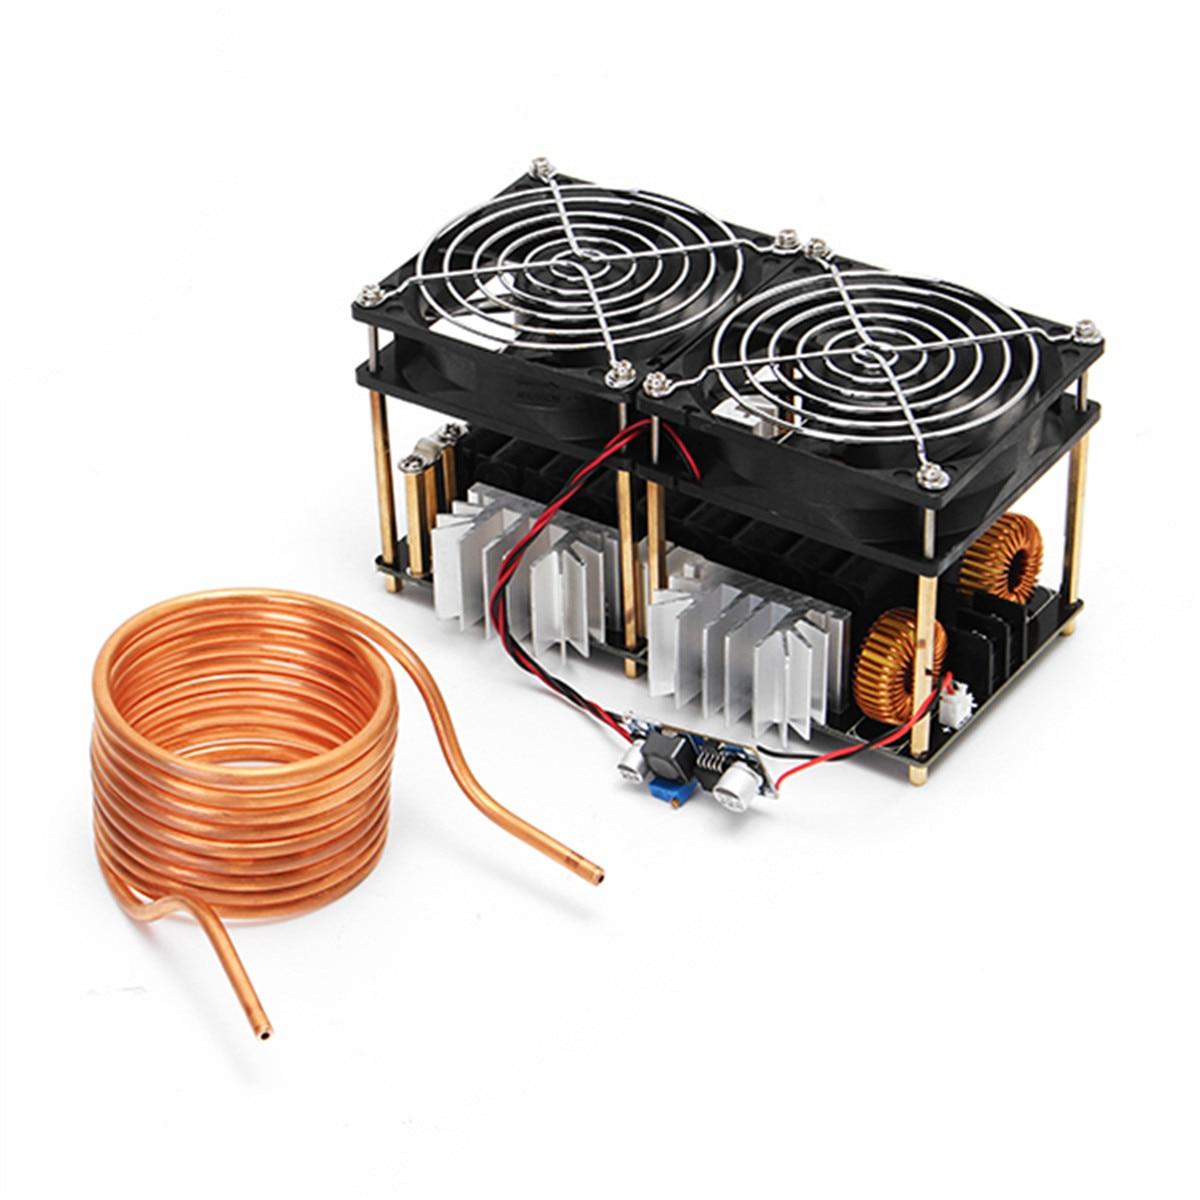 Soldering Prototype Copper Pcb Printed Circuit Board 70x90mm 2 Ebay